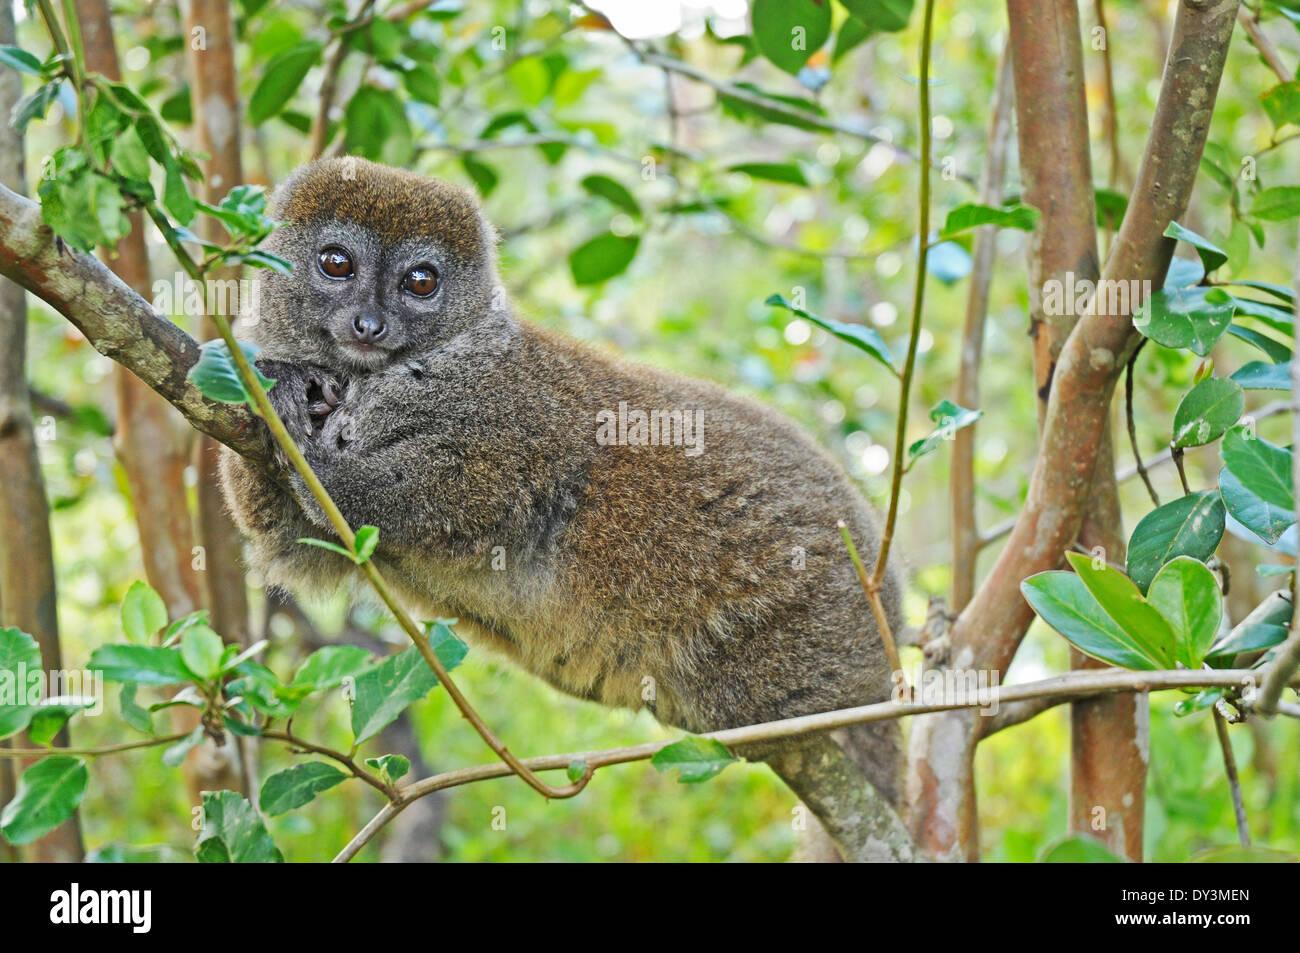 Eastern grey bamboo lemur (Hapalemur griseus), also known as the Eastern grey gentle lemur or Eastern lesser bamboo lemur. - Stock Image